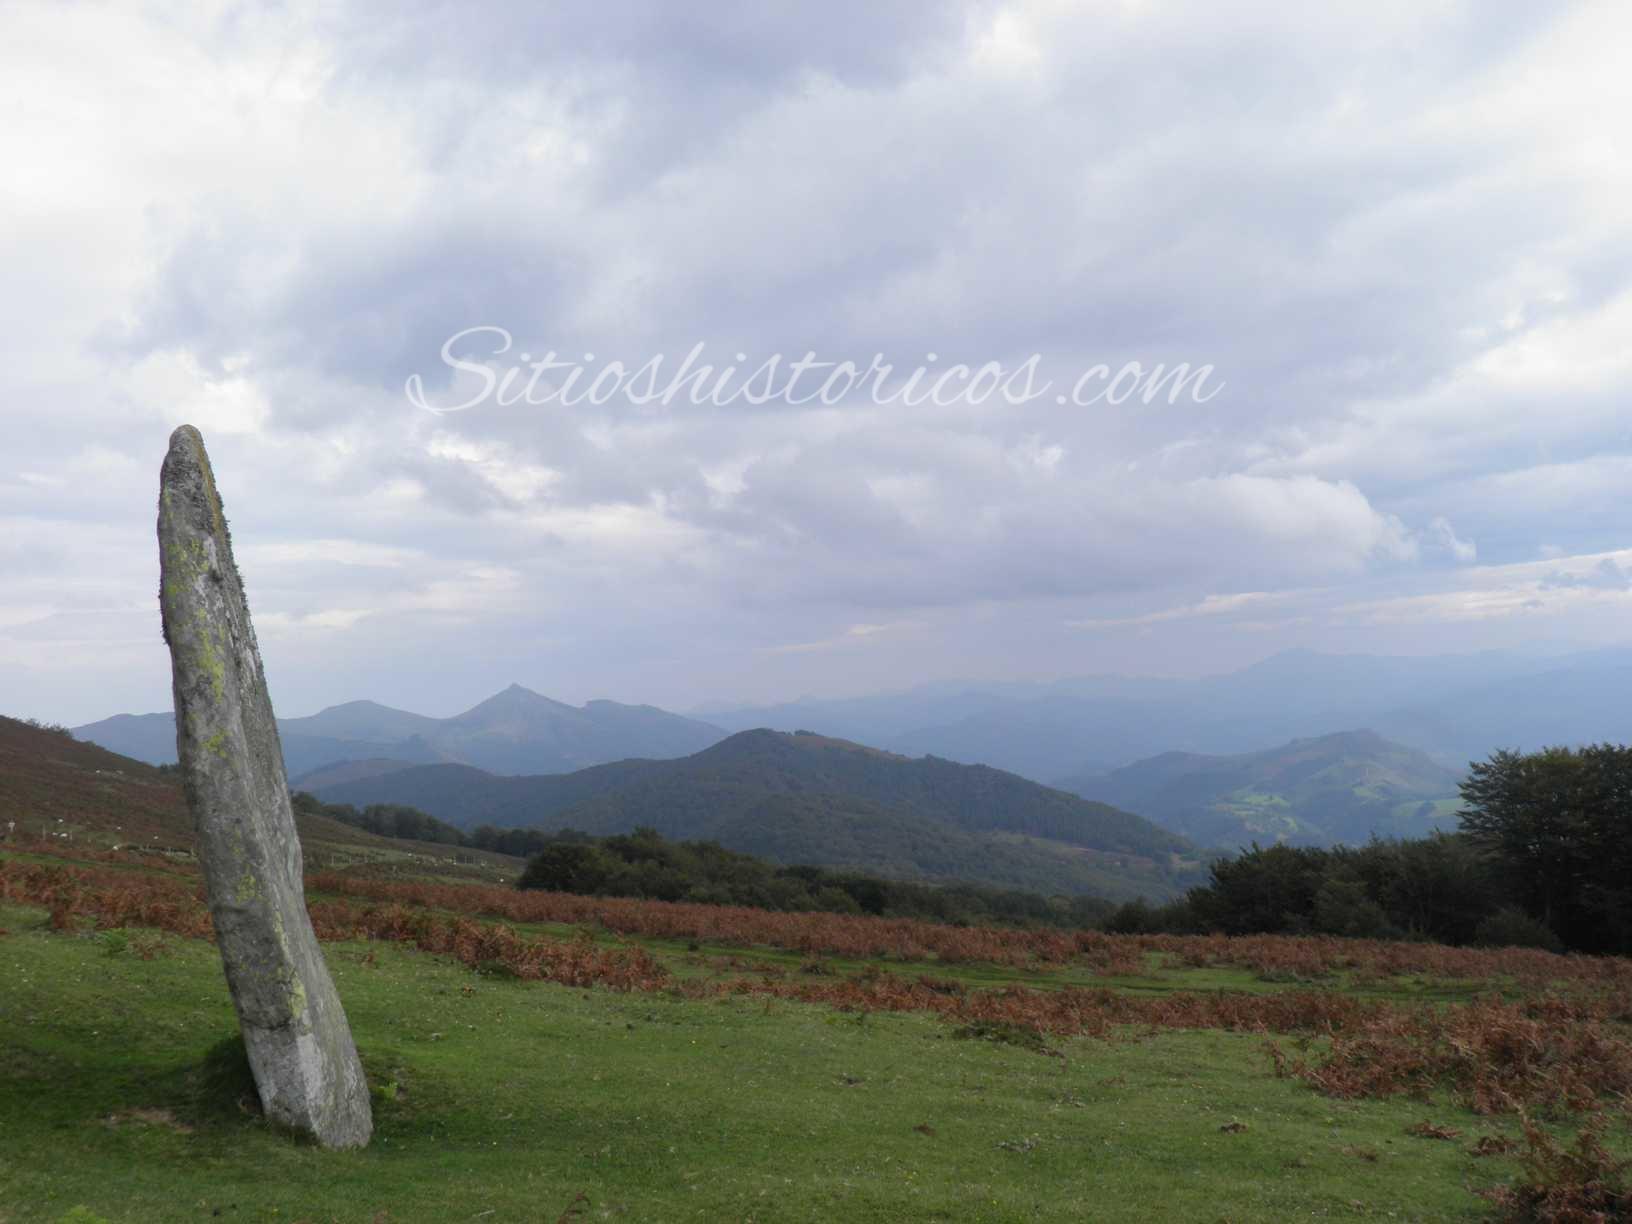 El majestuoso menhir de Irudiarri